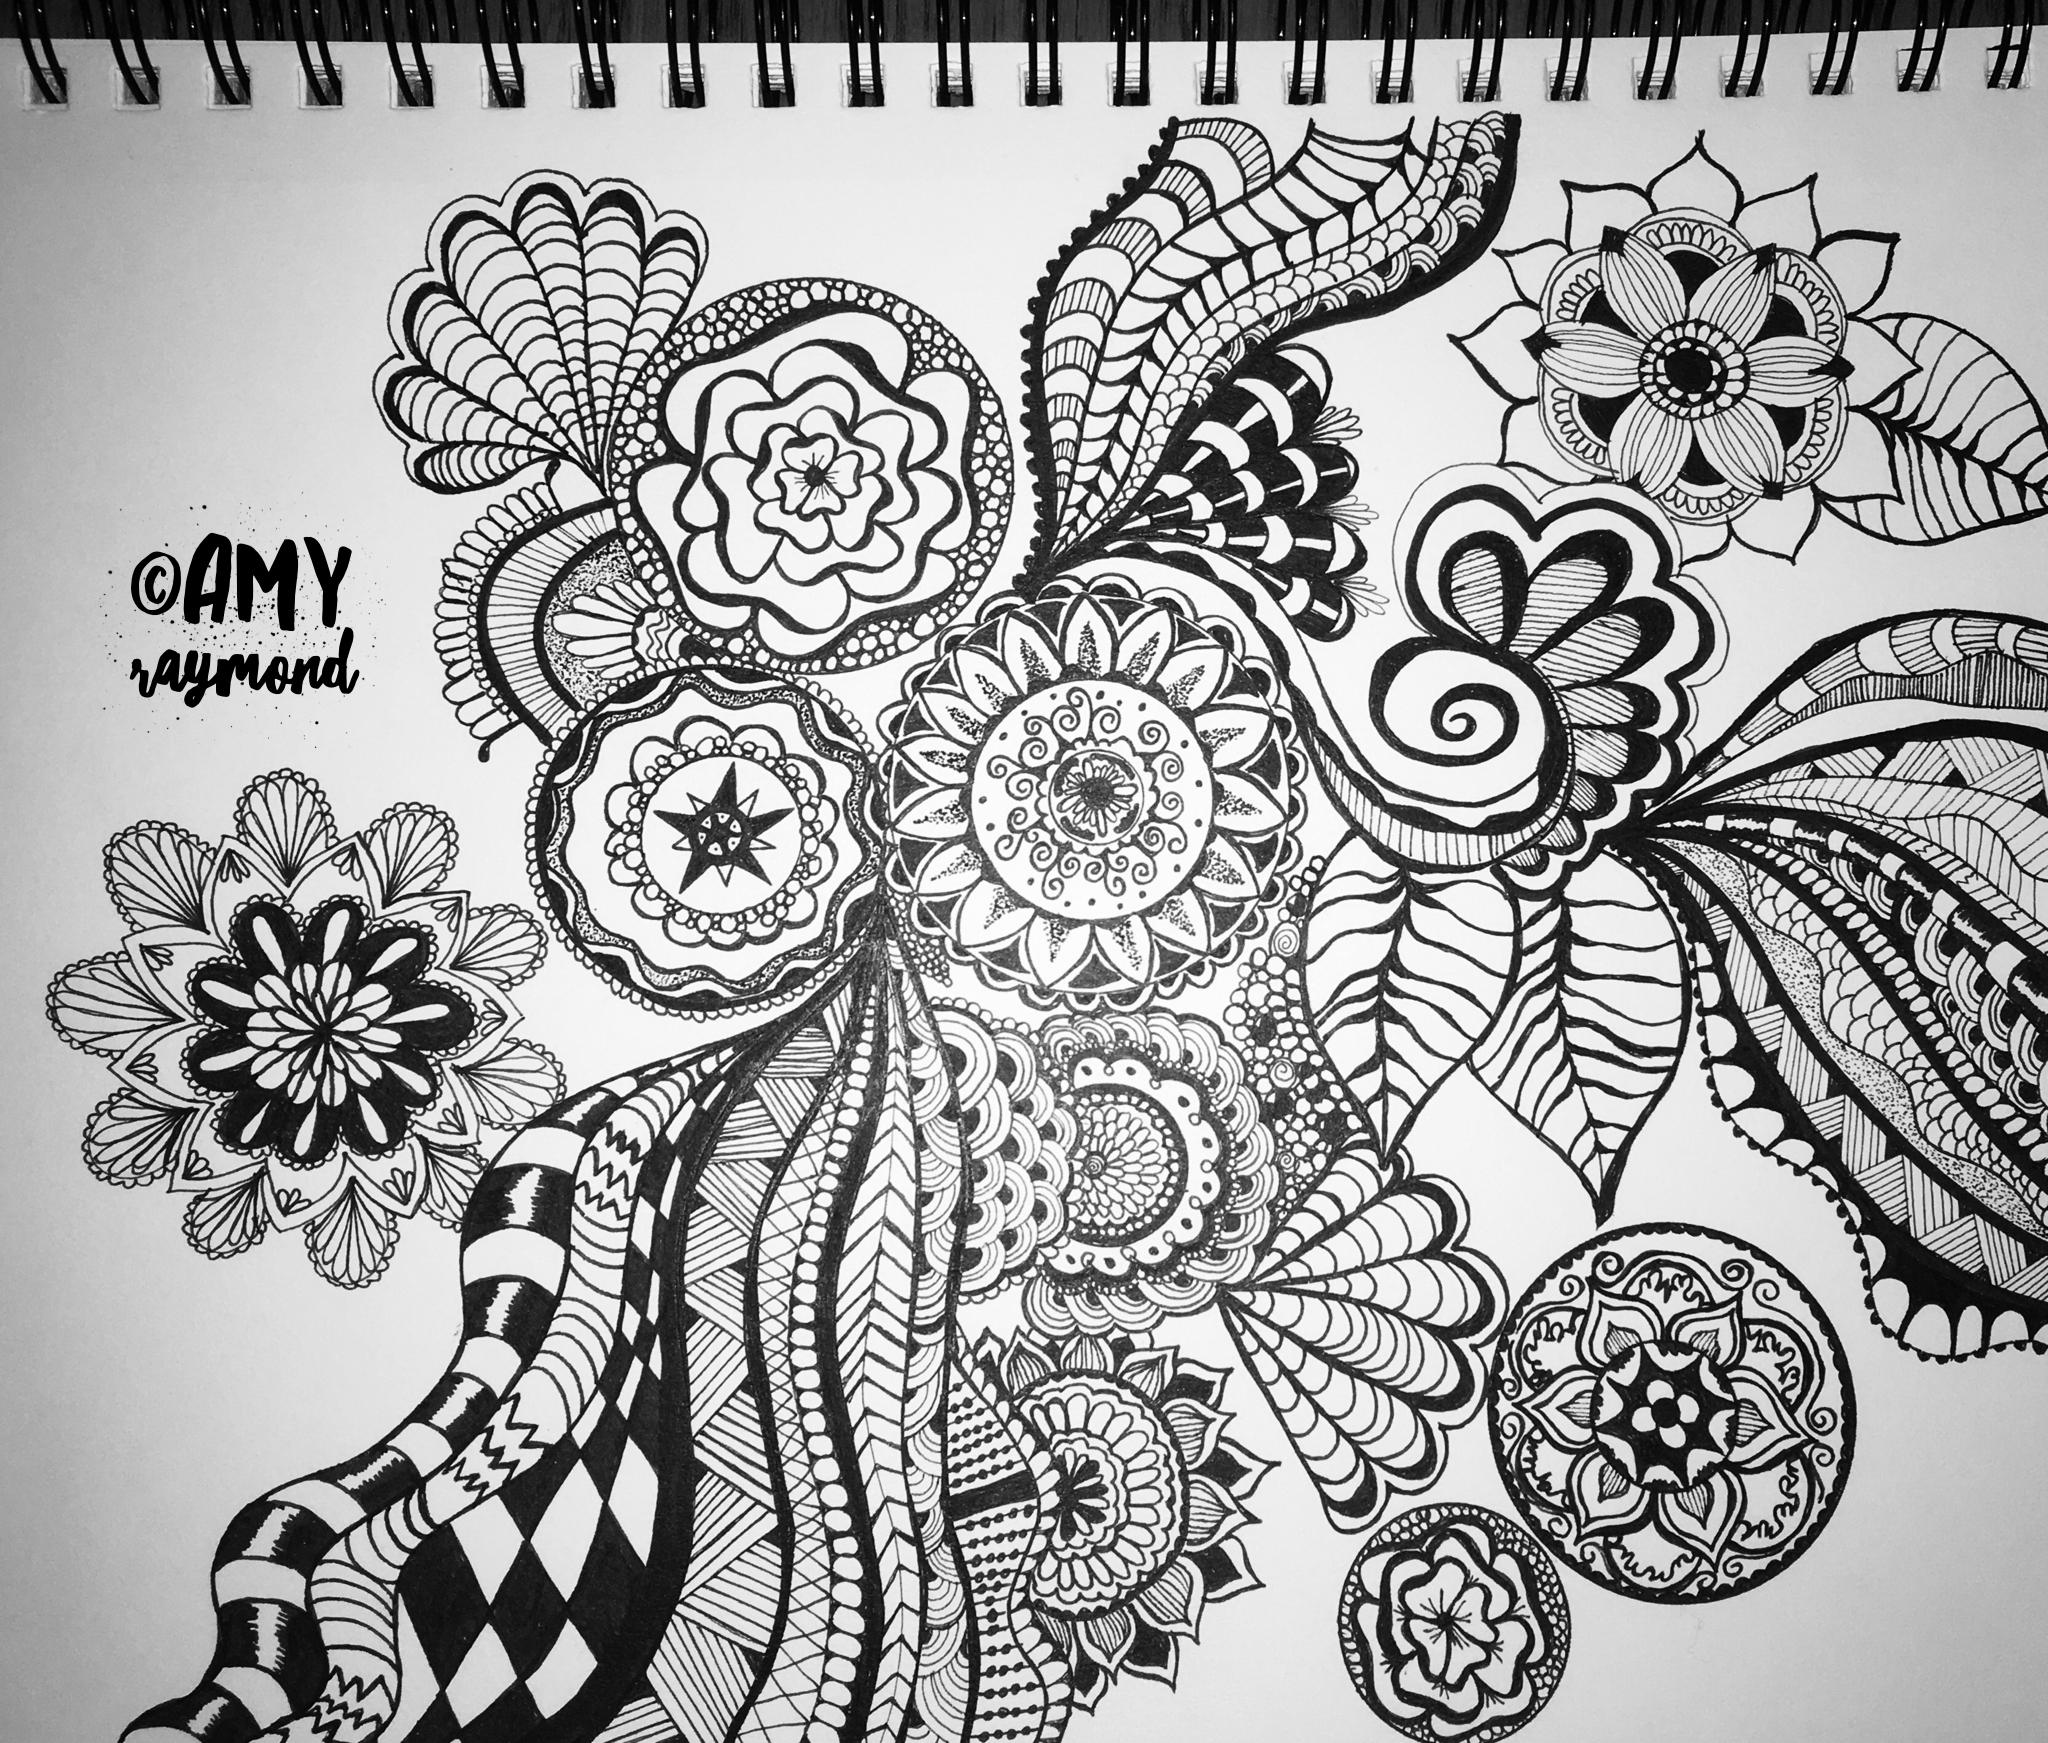 Zentangle 1 2 17 By Amy Raymond Doodle Micron Bw